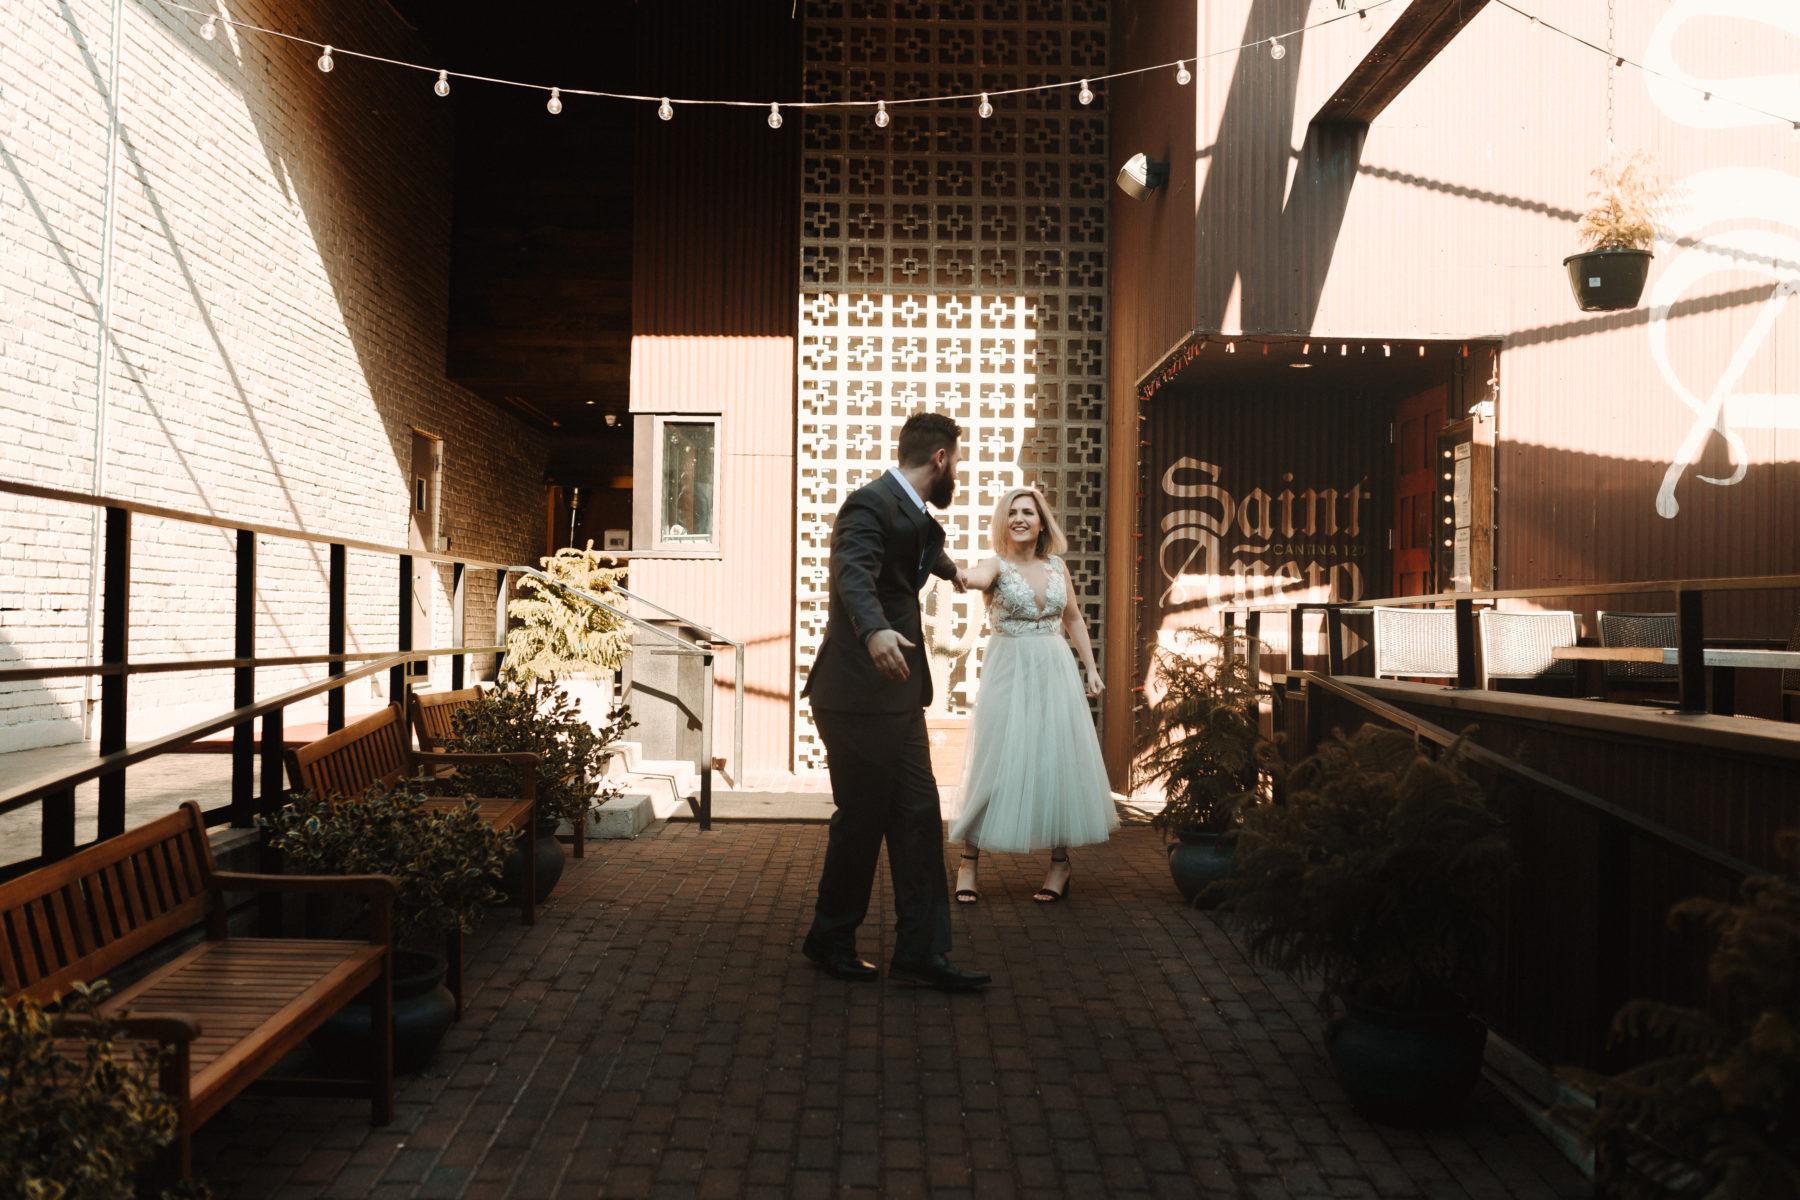 Dancing wedding photos: Nashville brunch elopement featured on Nashville Bride Guide